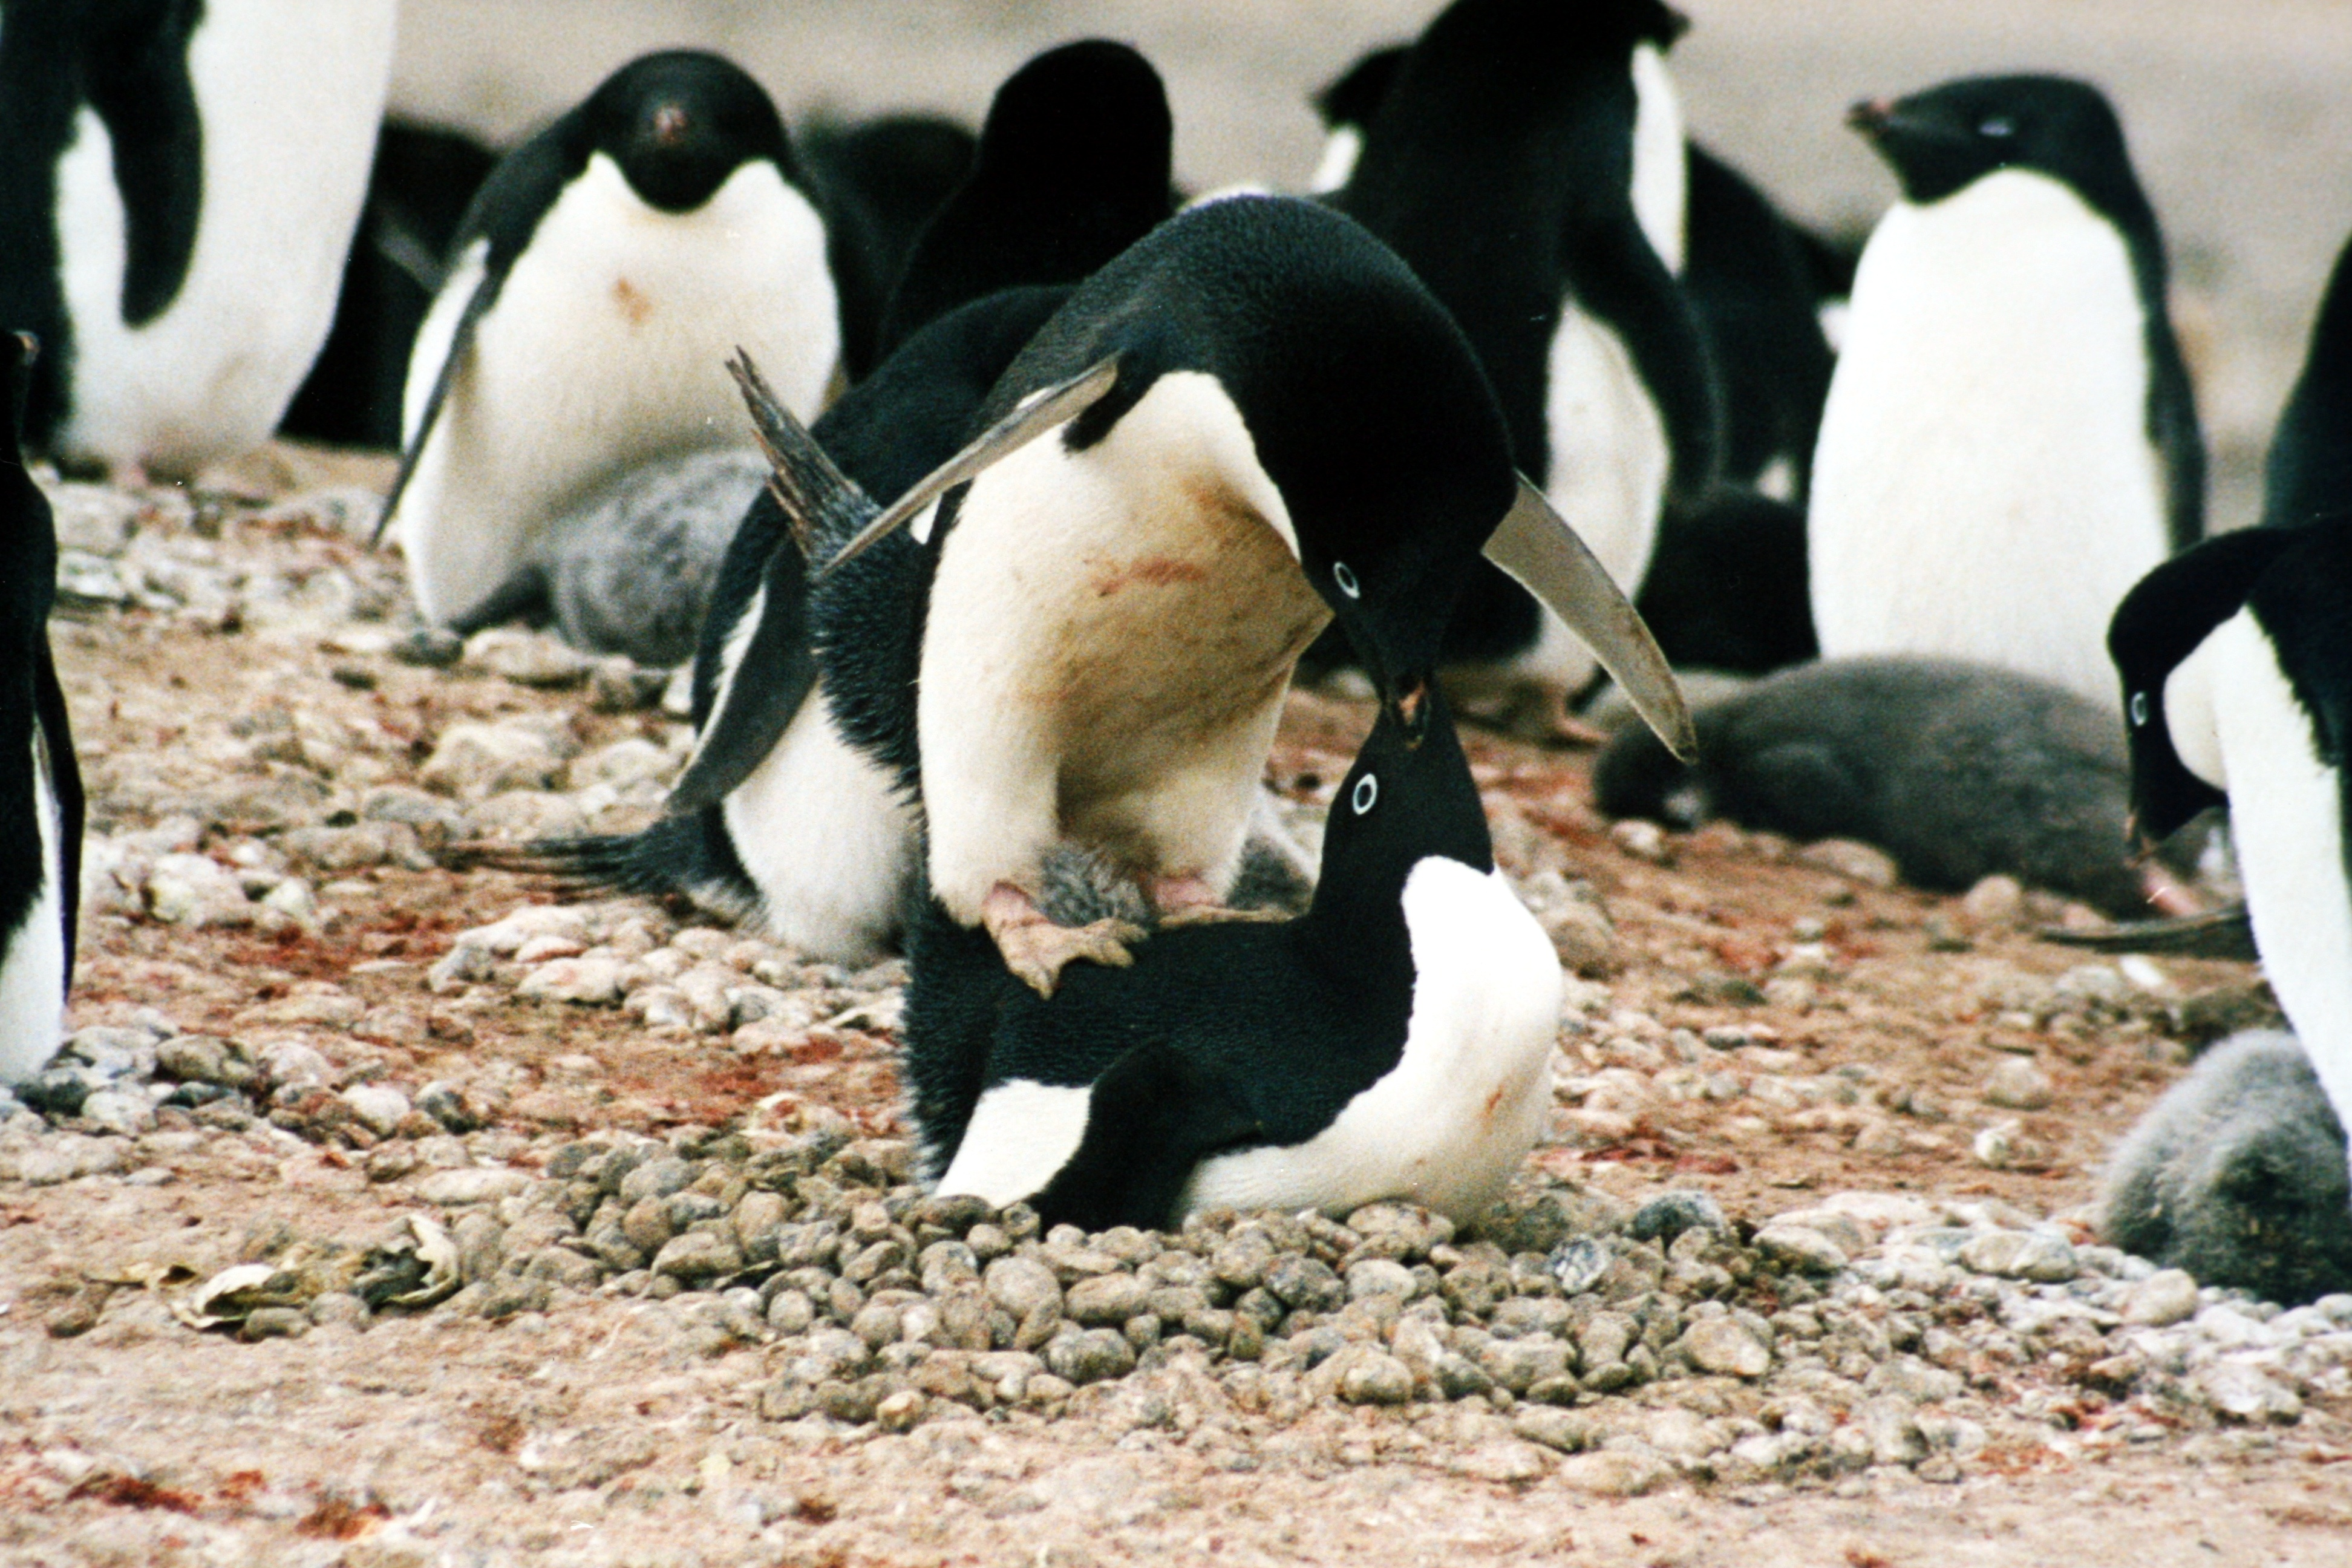 File:Mating adele.JPG - Wikipedia